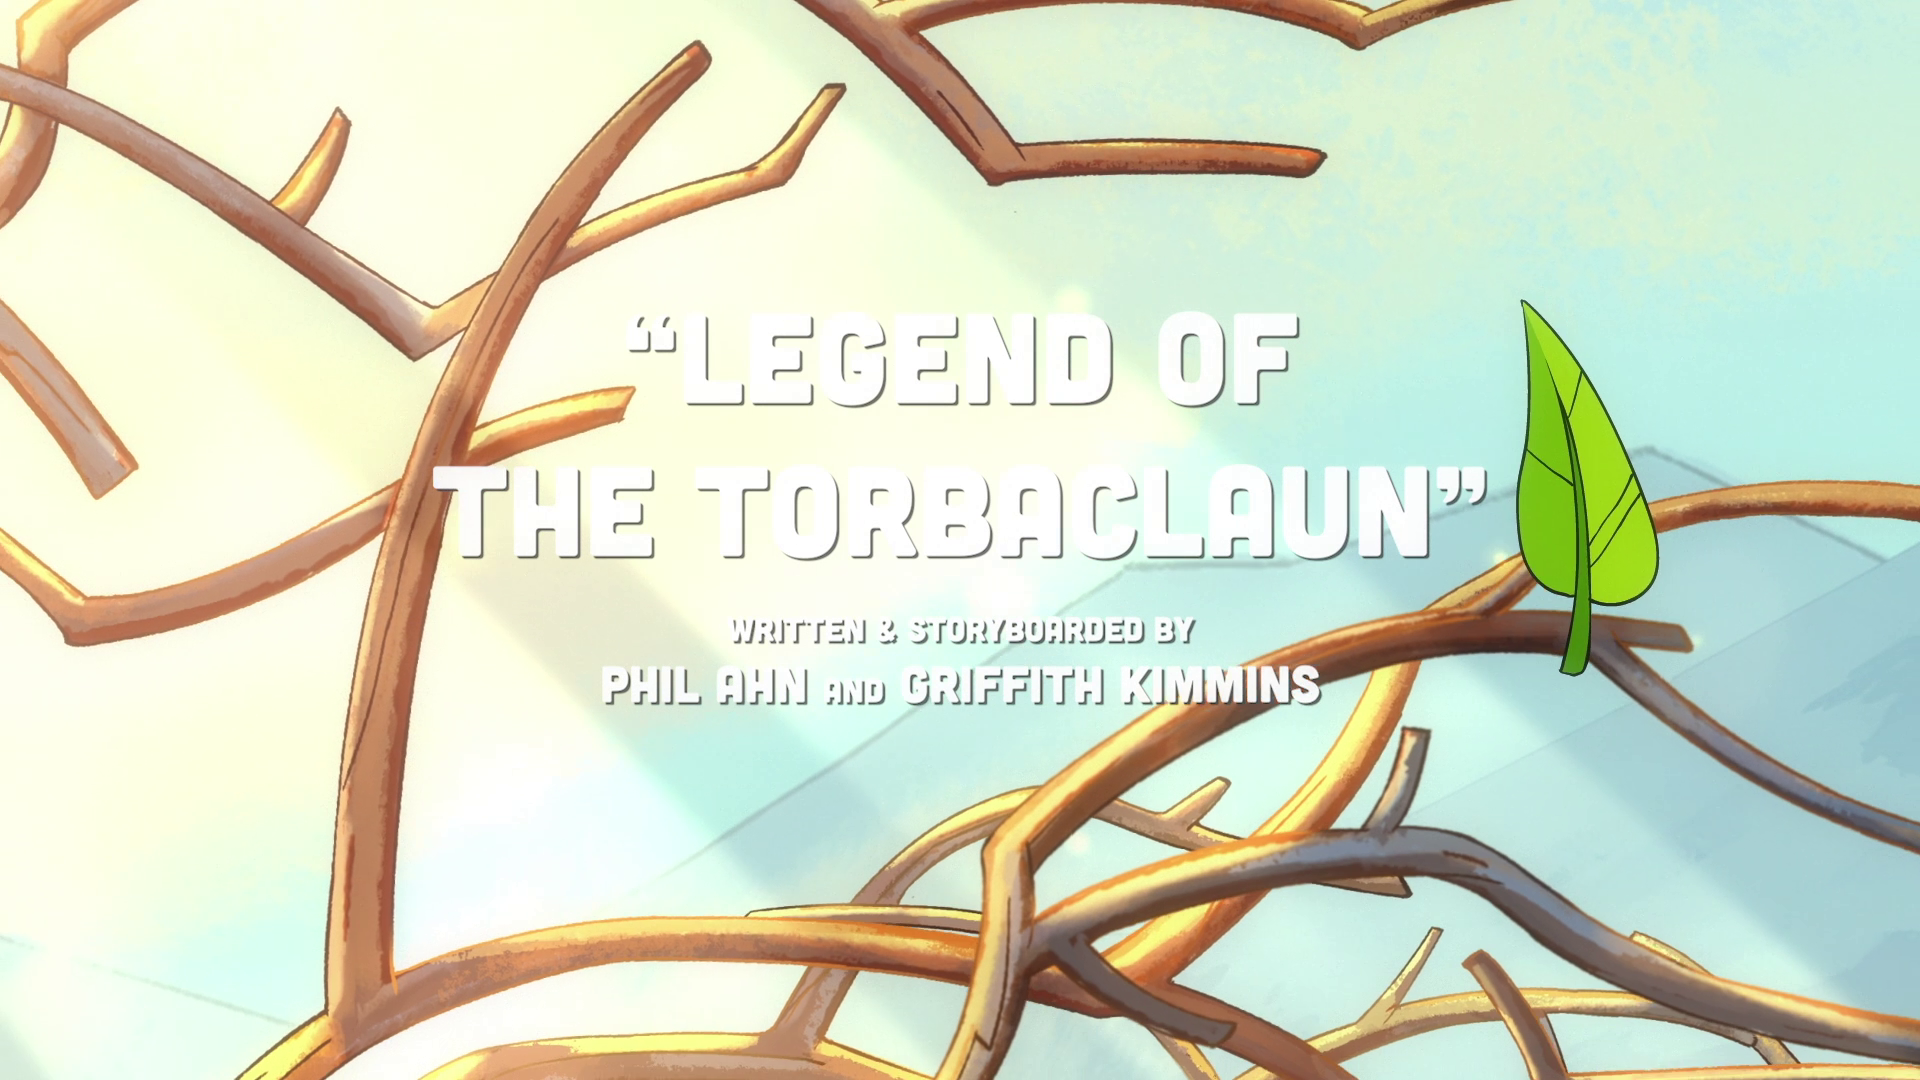 Legend of the Torbaclaun/Gallery